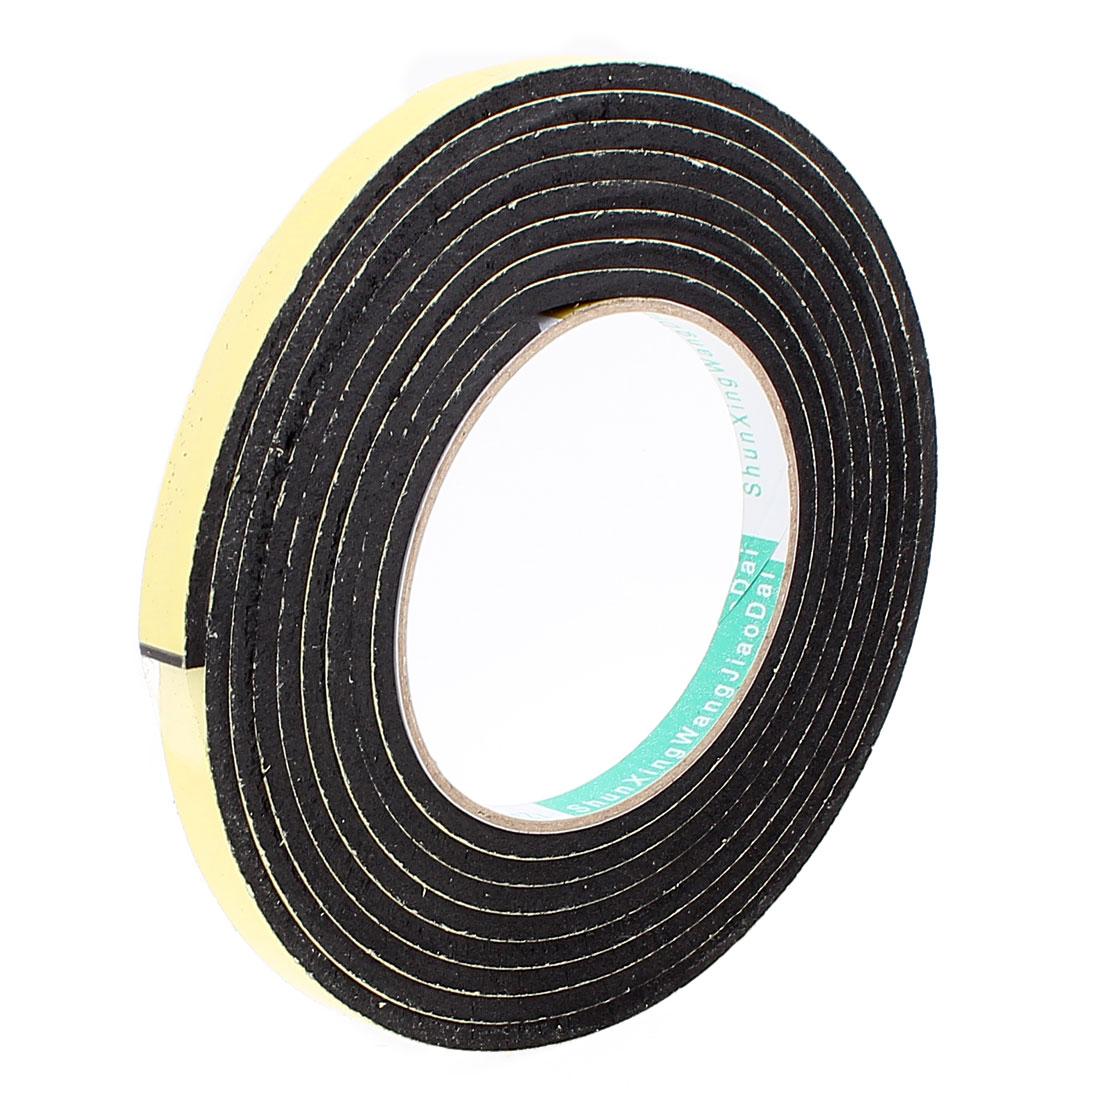 3 Meters 10mm x 4mm Single Side Adhesive EVA Foam Sealing Tap